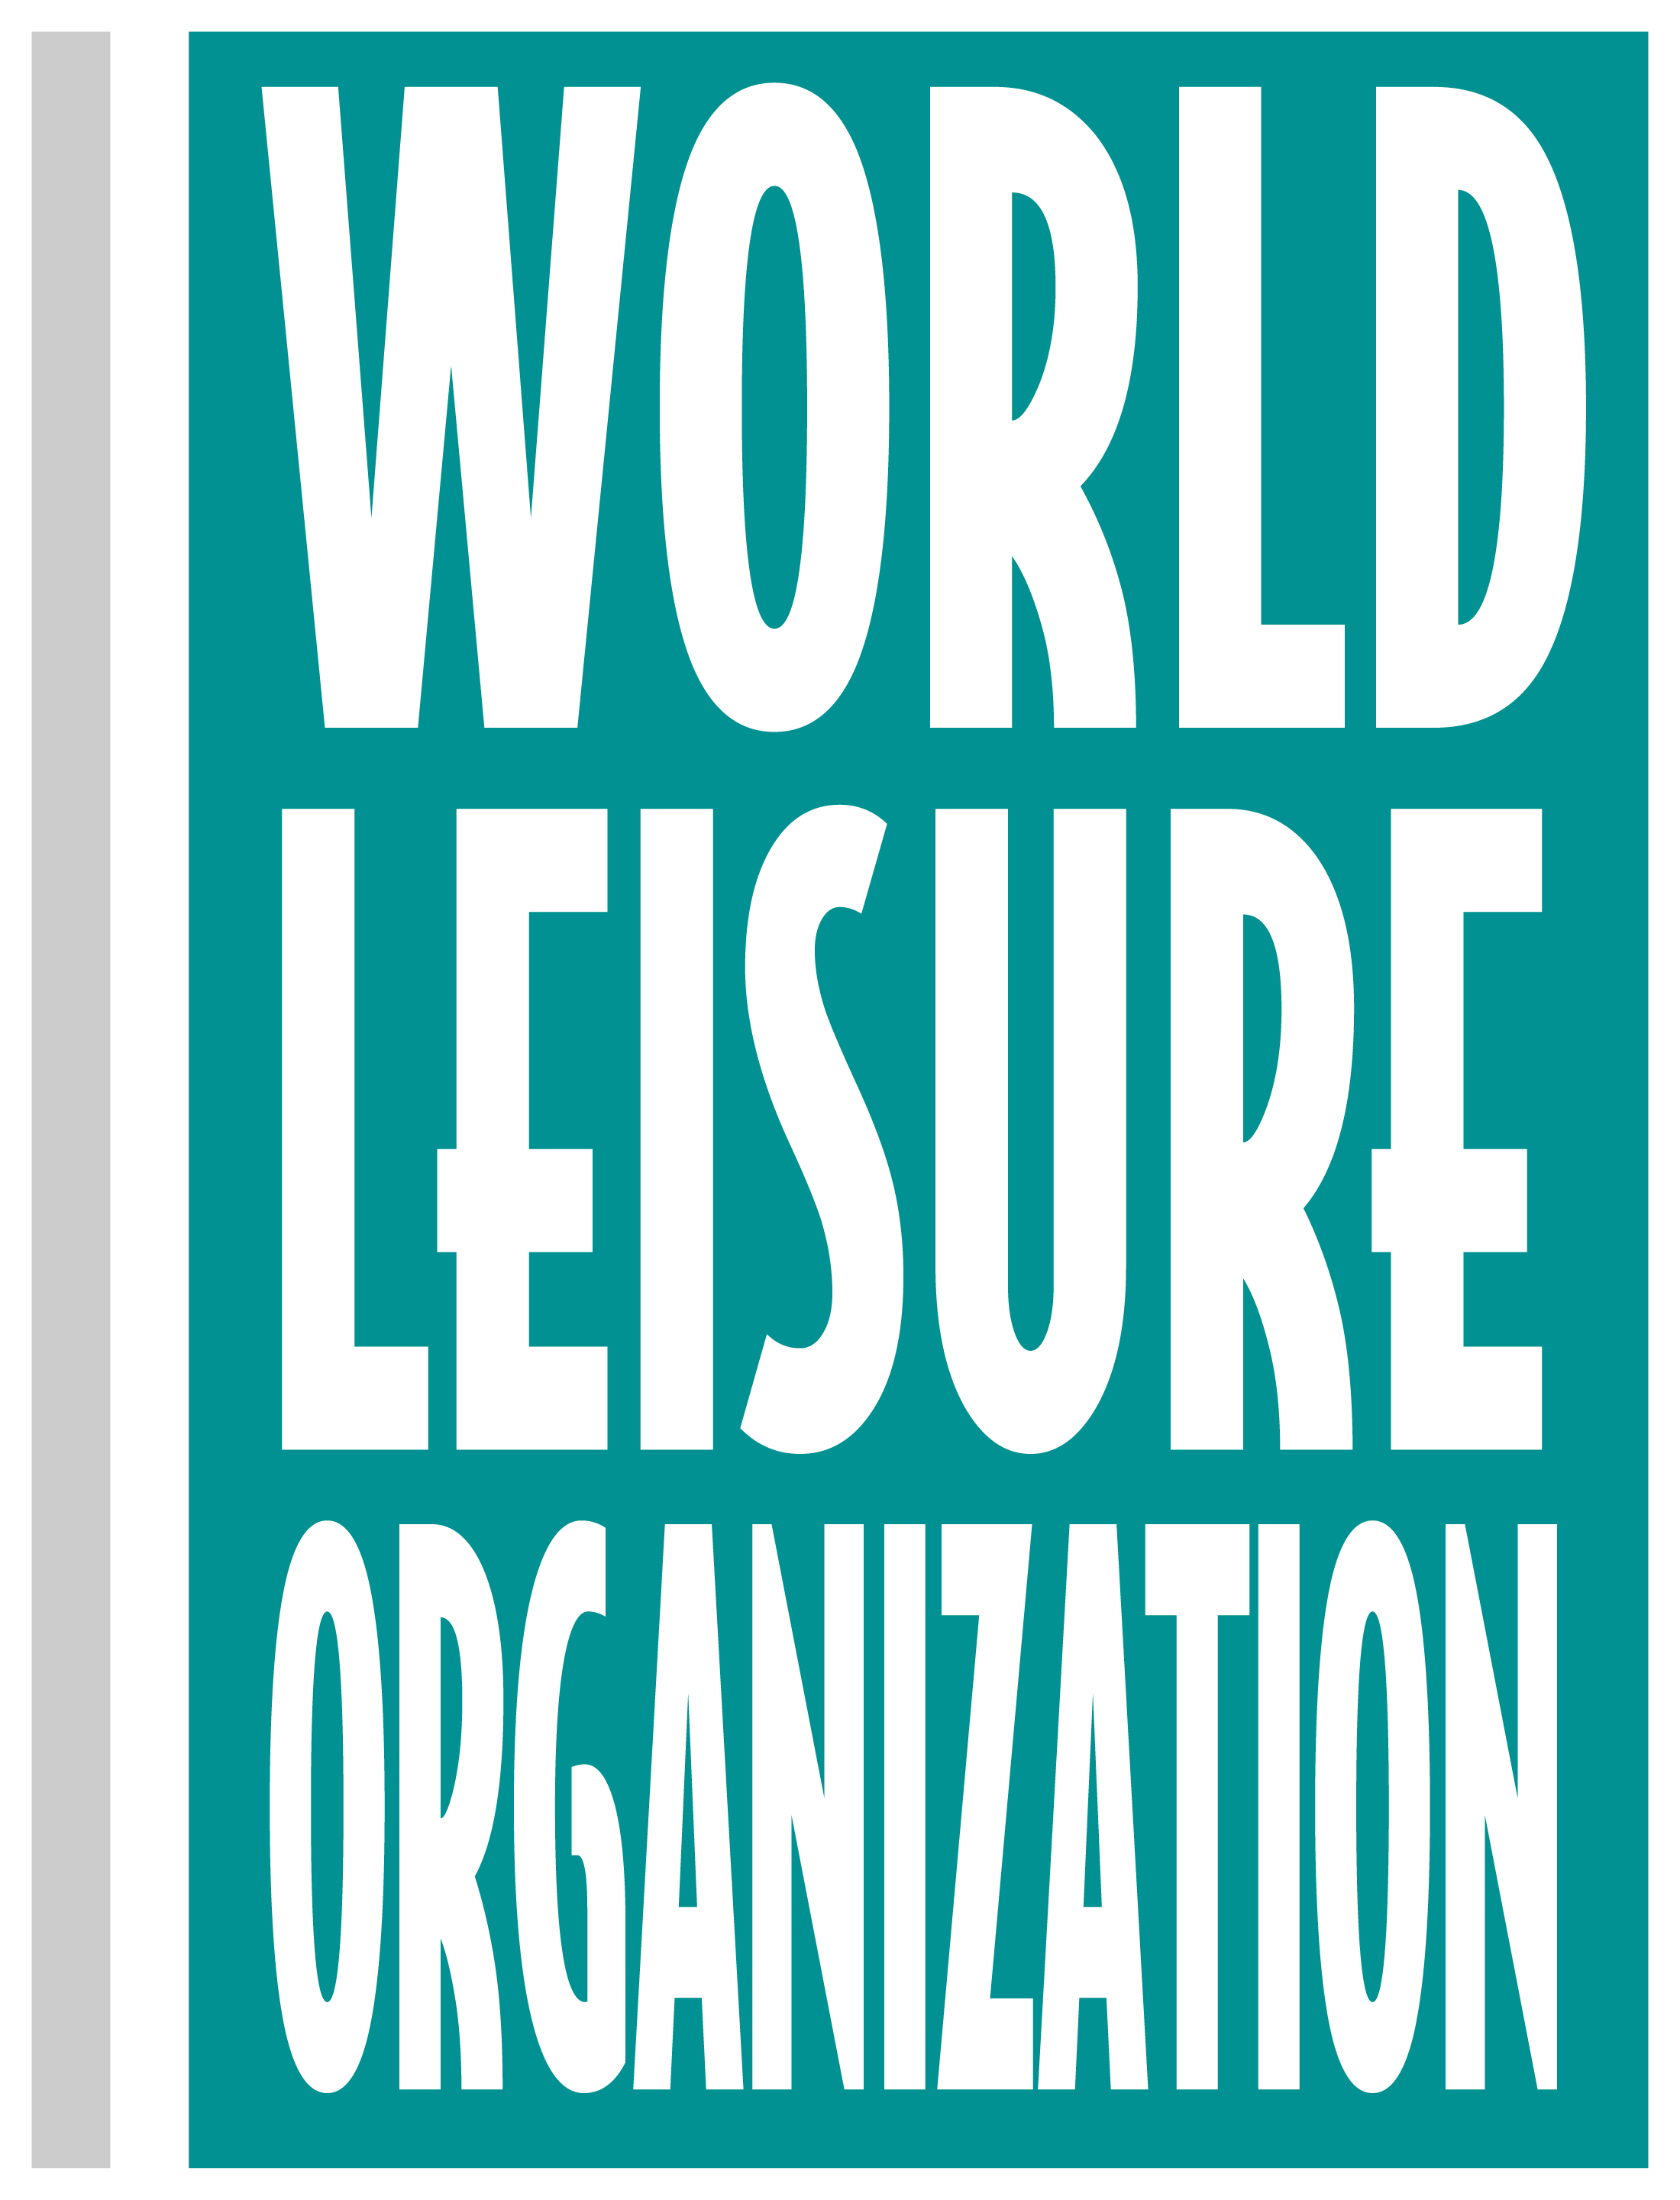 World Leisure Organization